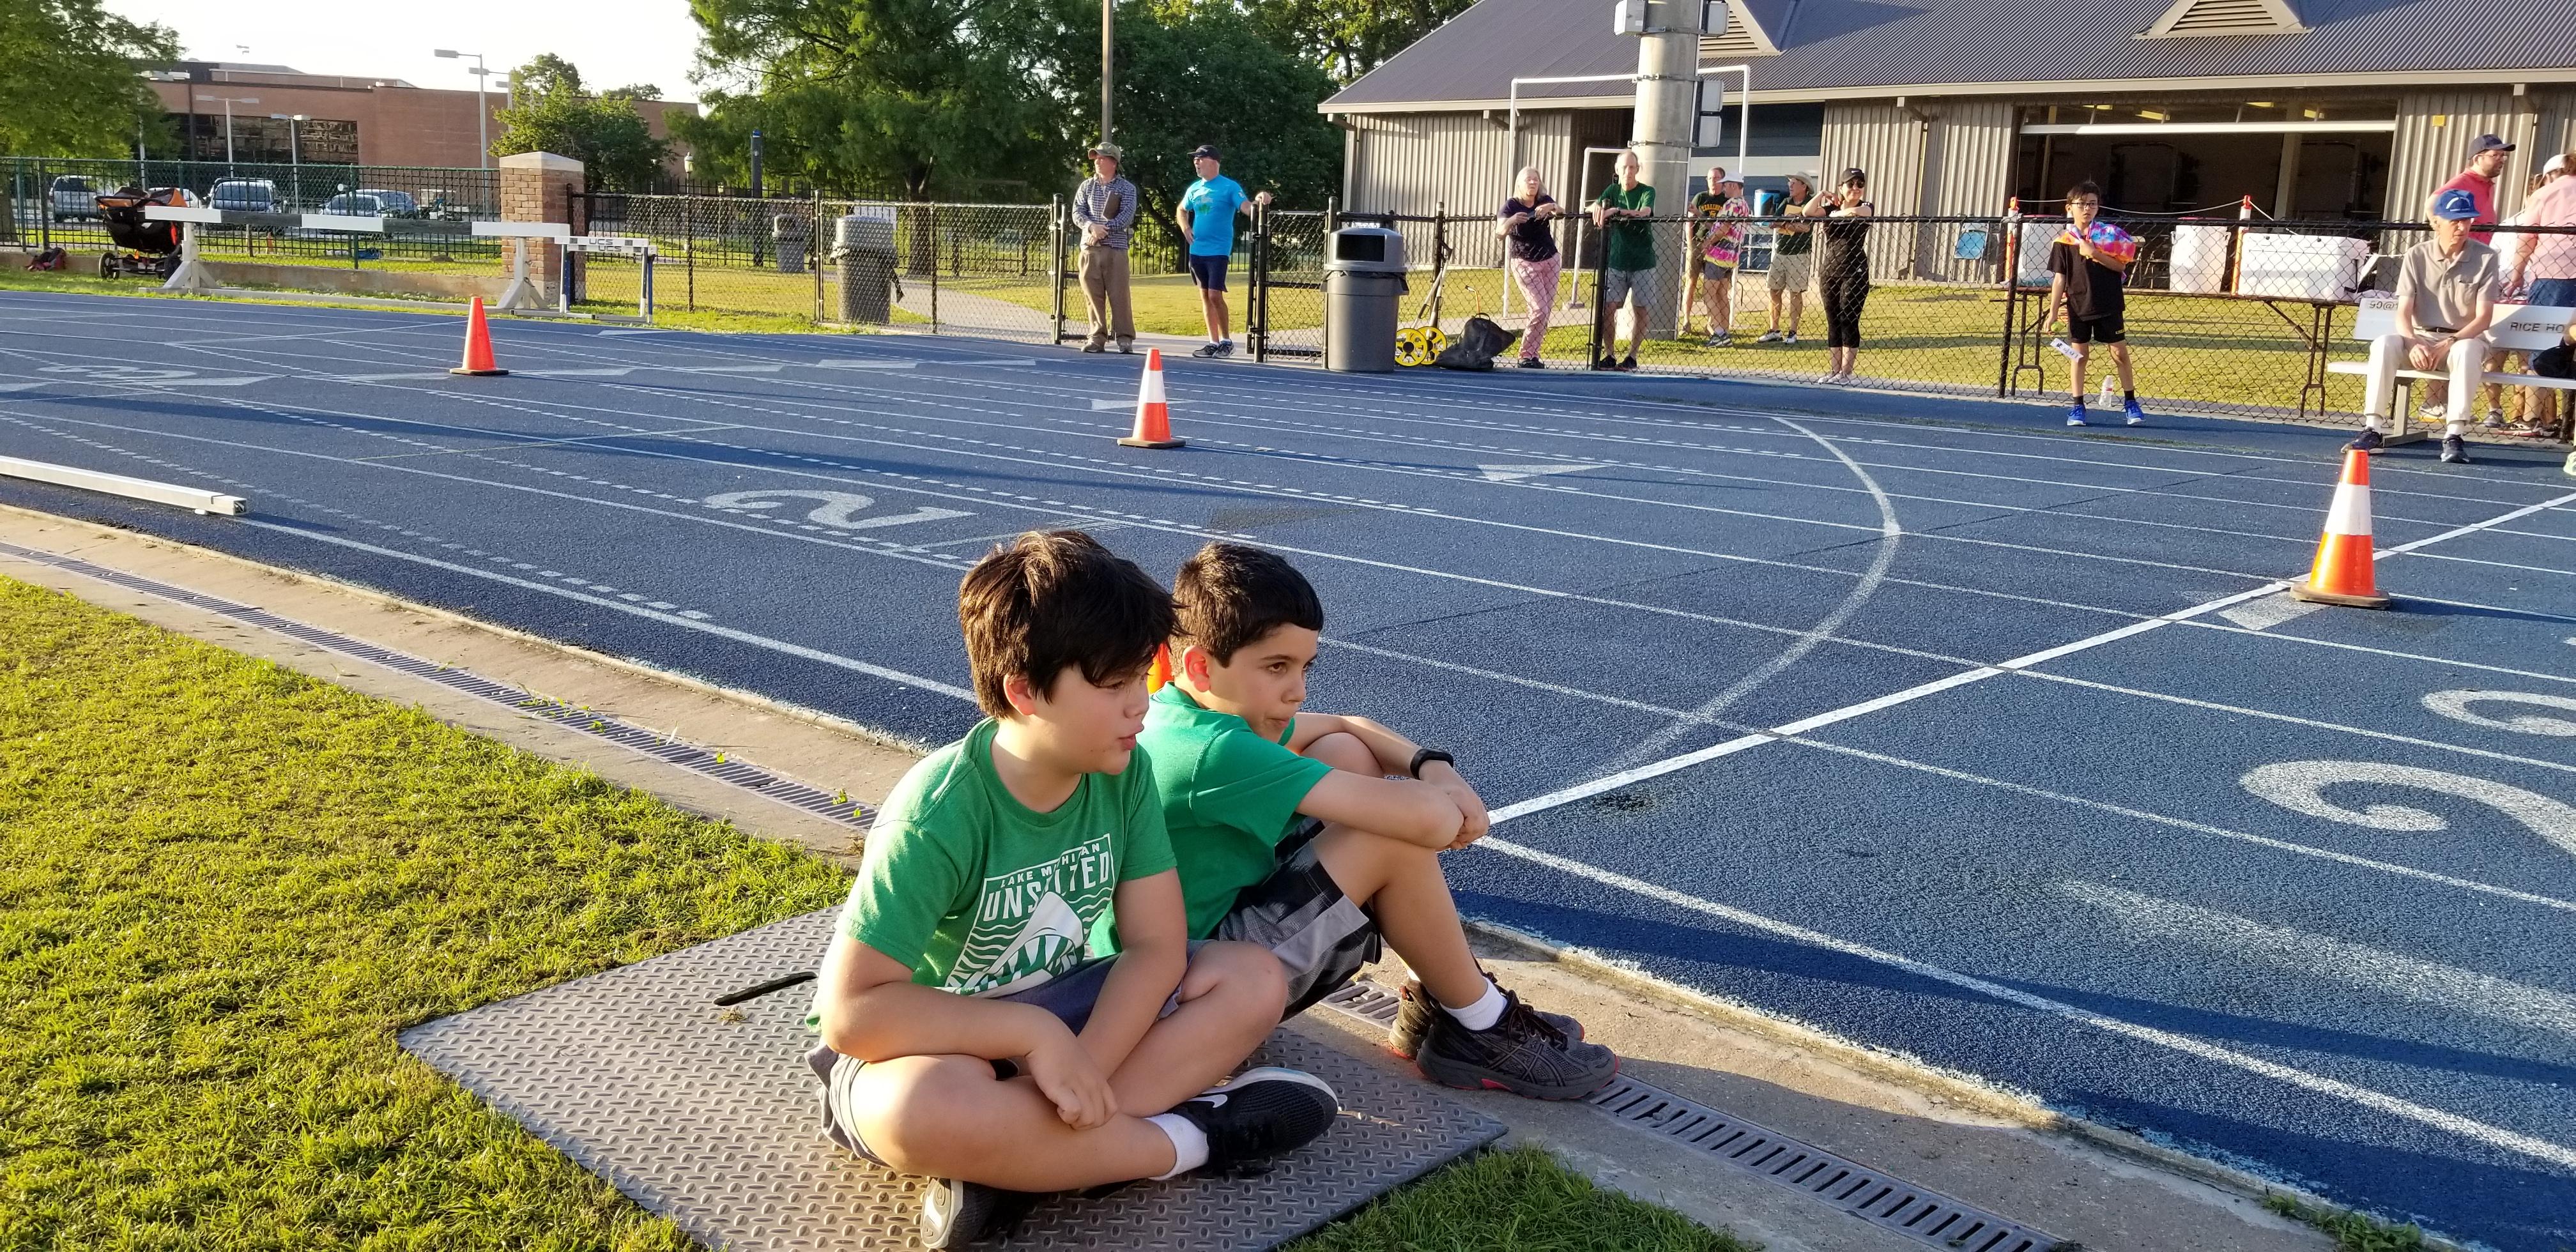 LP Run 2019 Young Runners Contemplating Kids Run